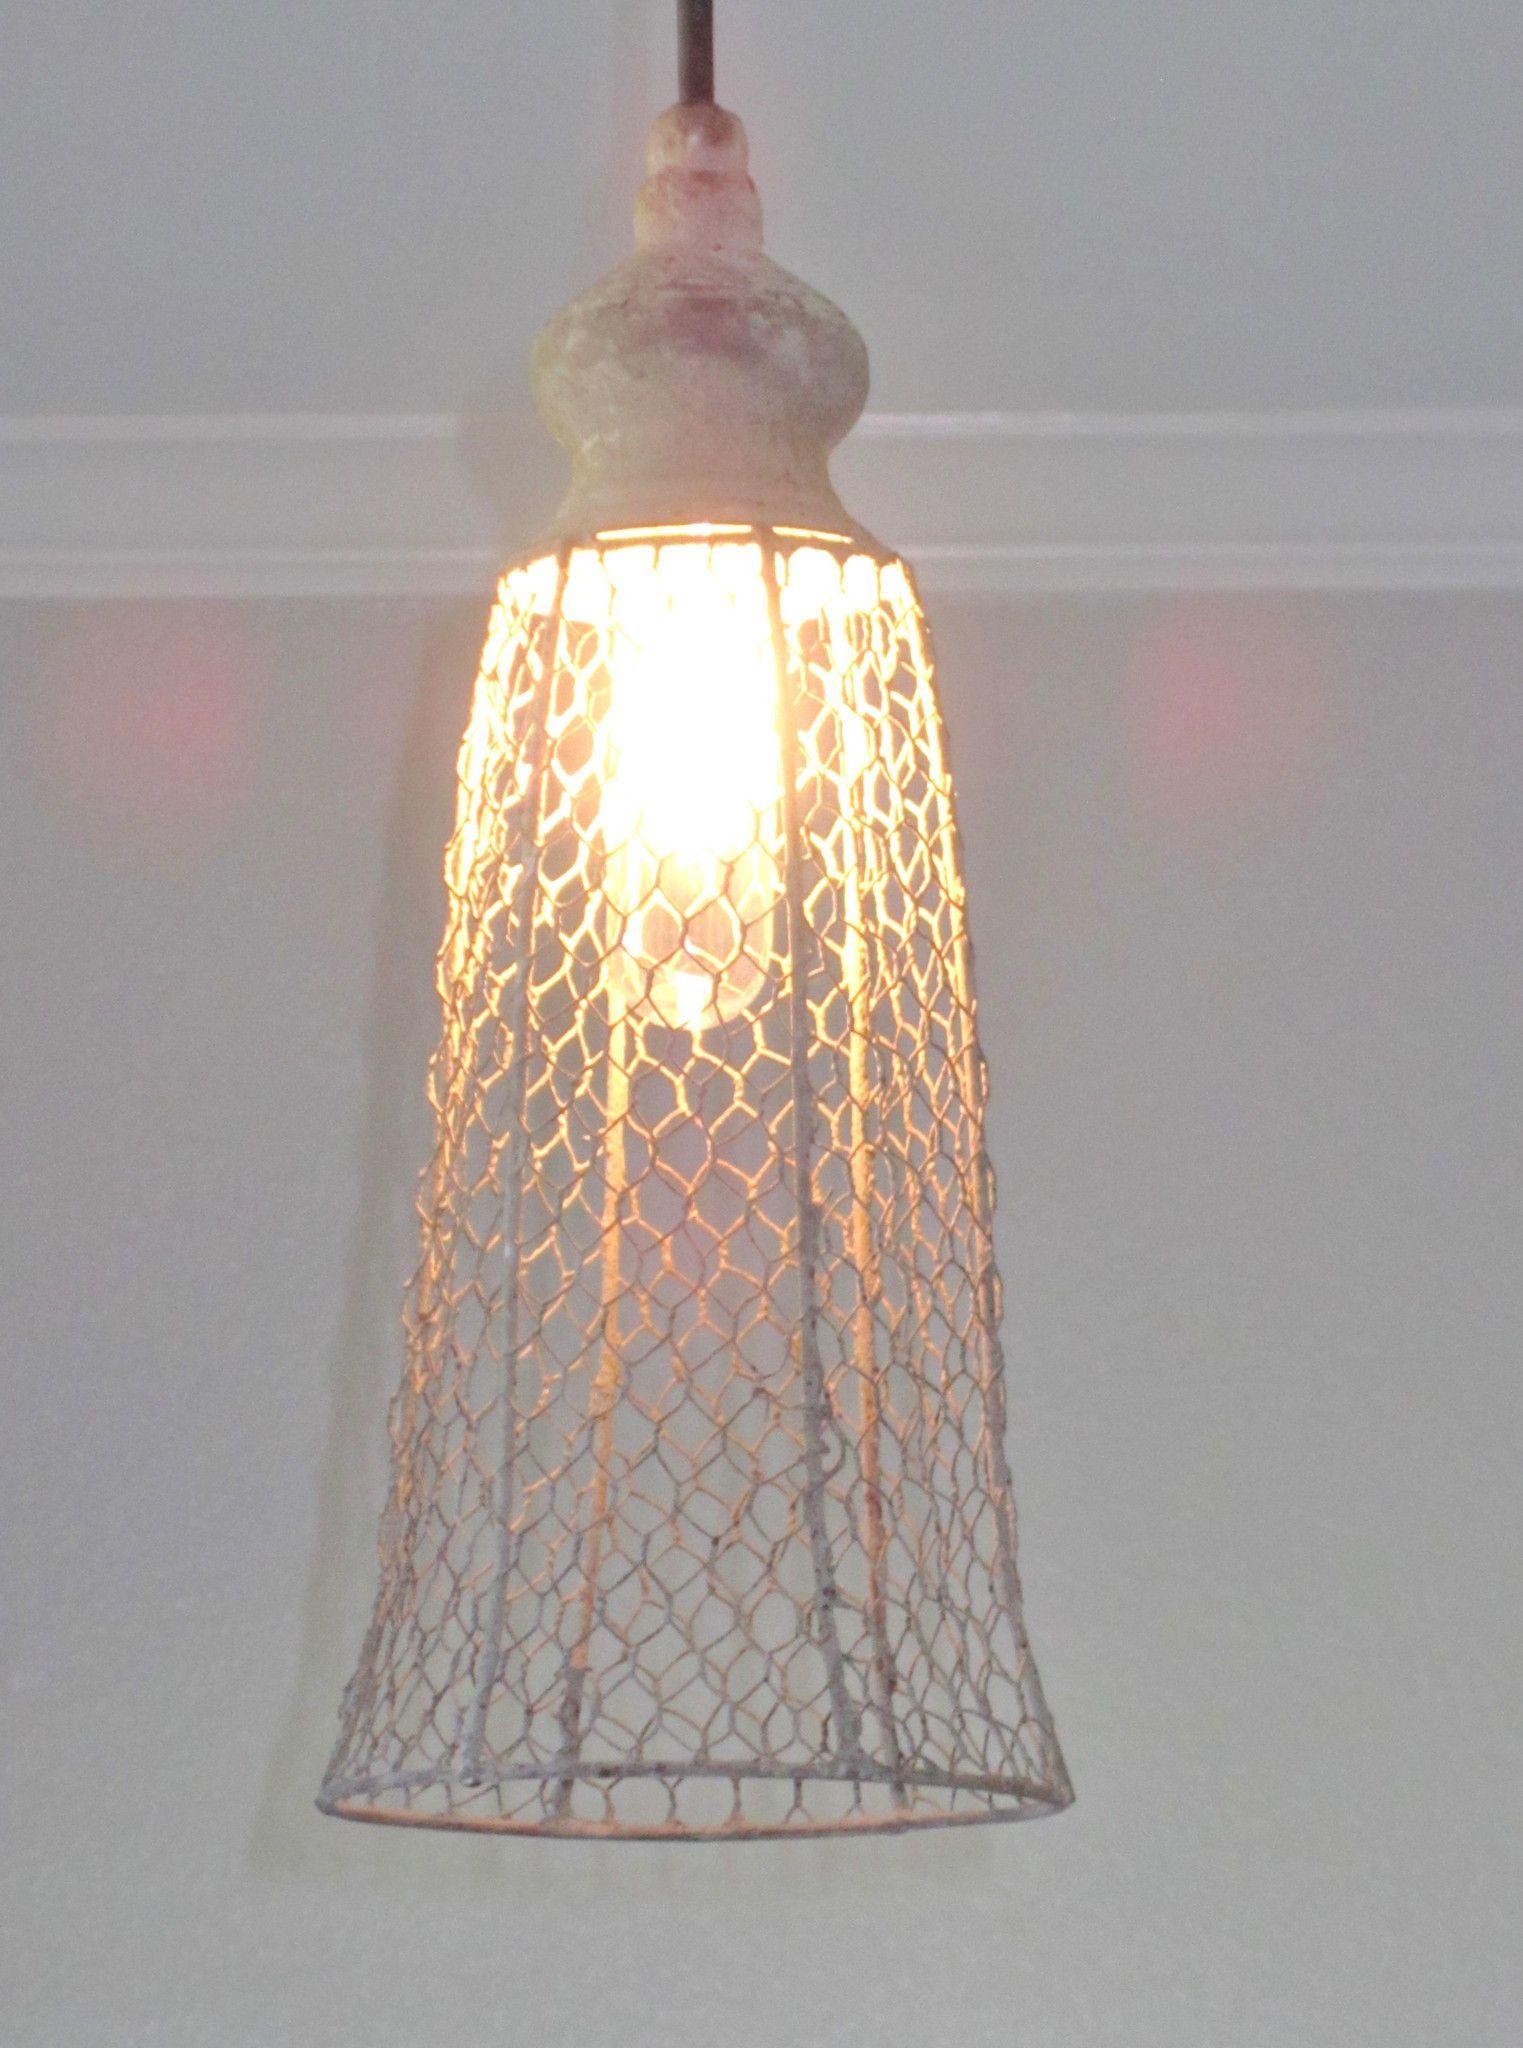 Rustic Wire Lantern Pendant Light | Pinterest | Lantern pendant ...